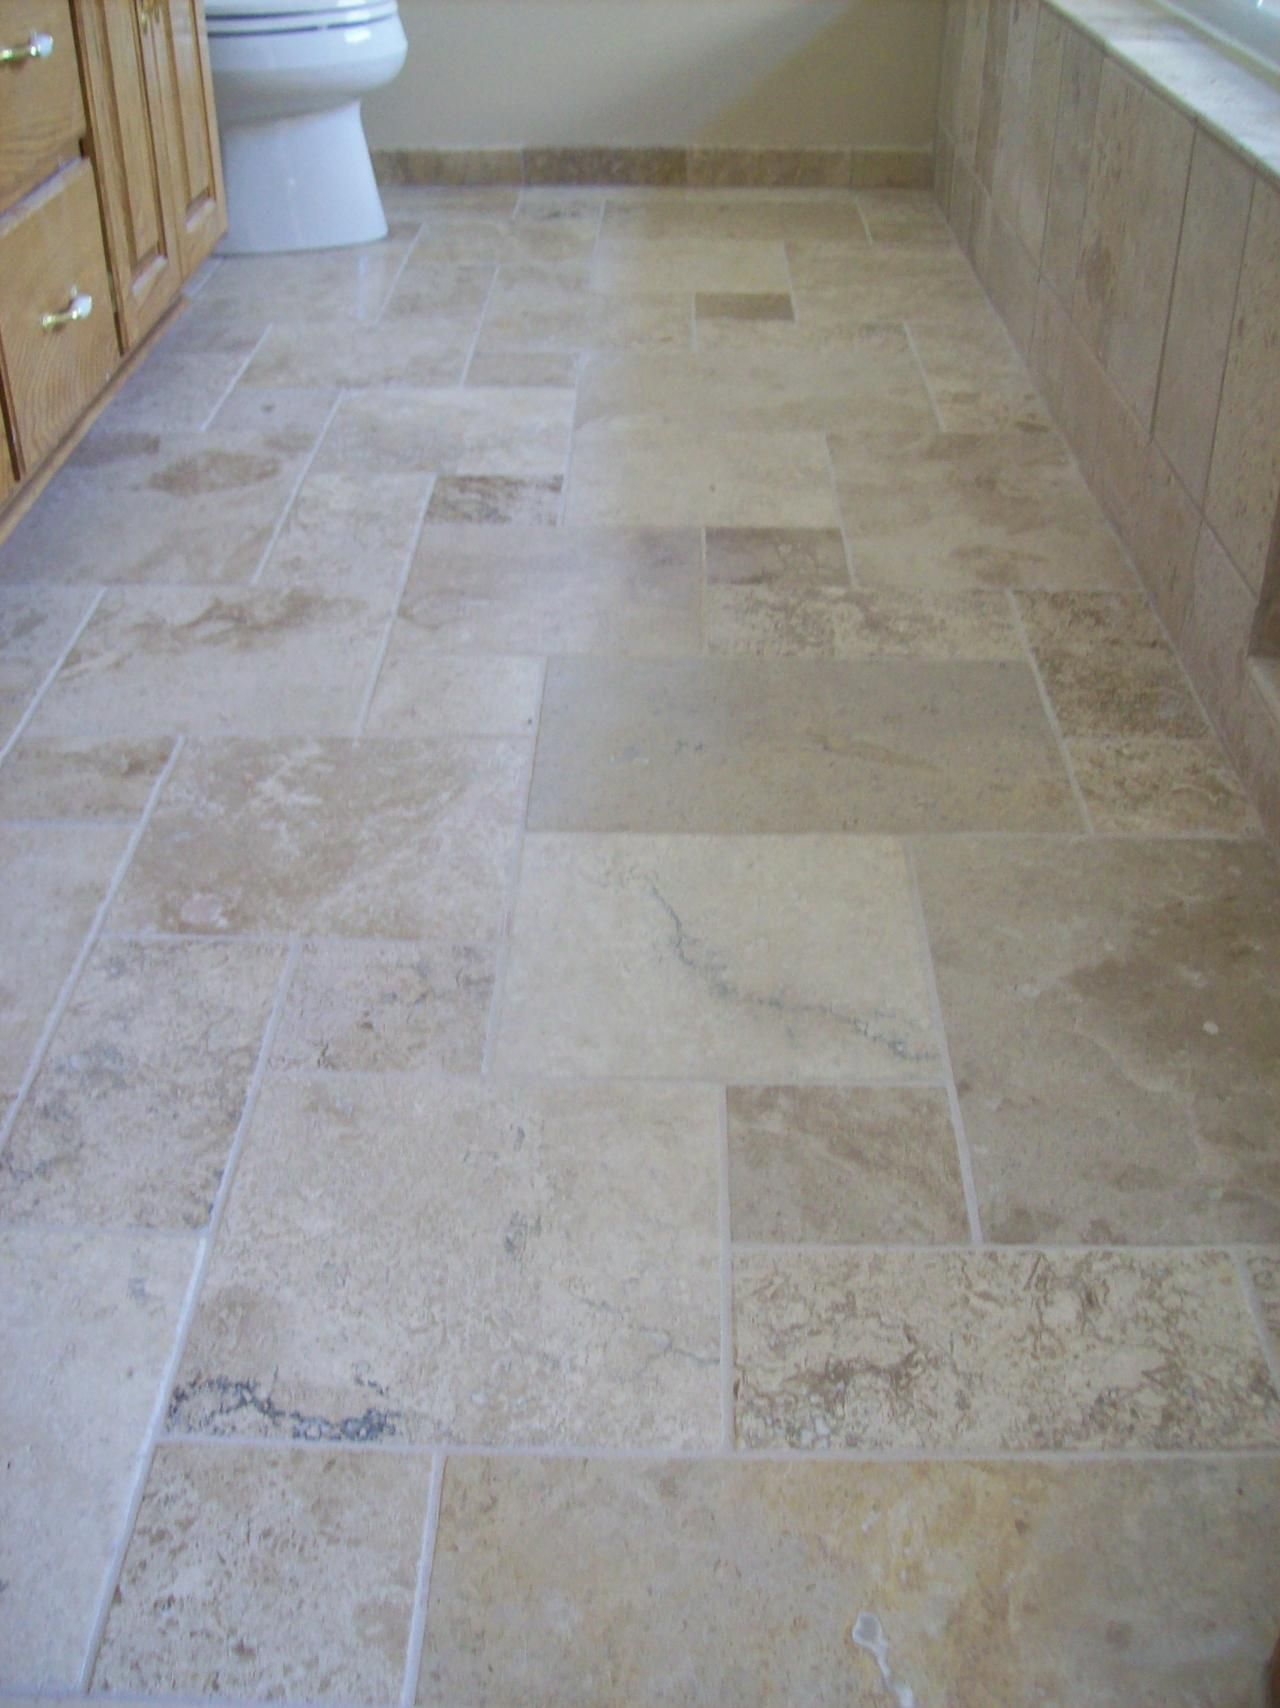 Enjoyable Bathroom Using Cream Natural Stone Floor Tile In Cream